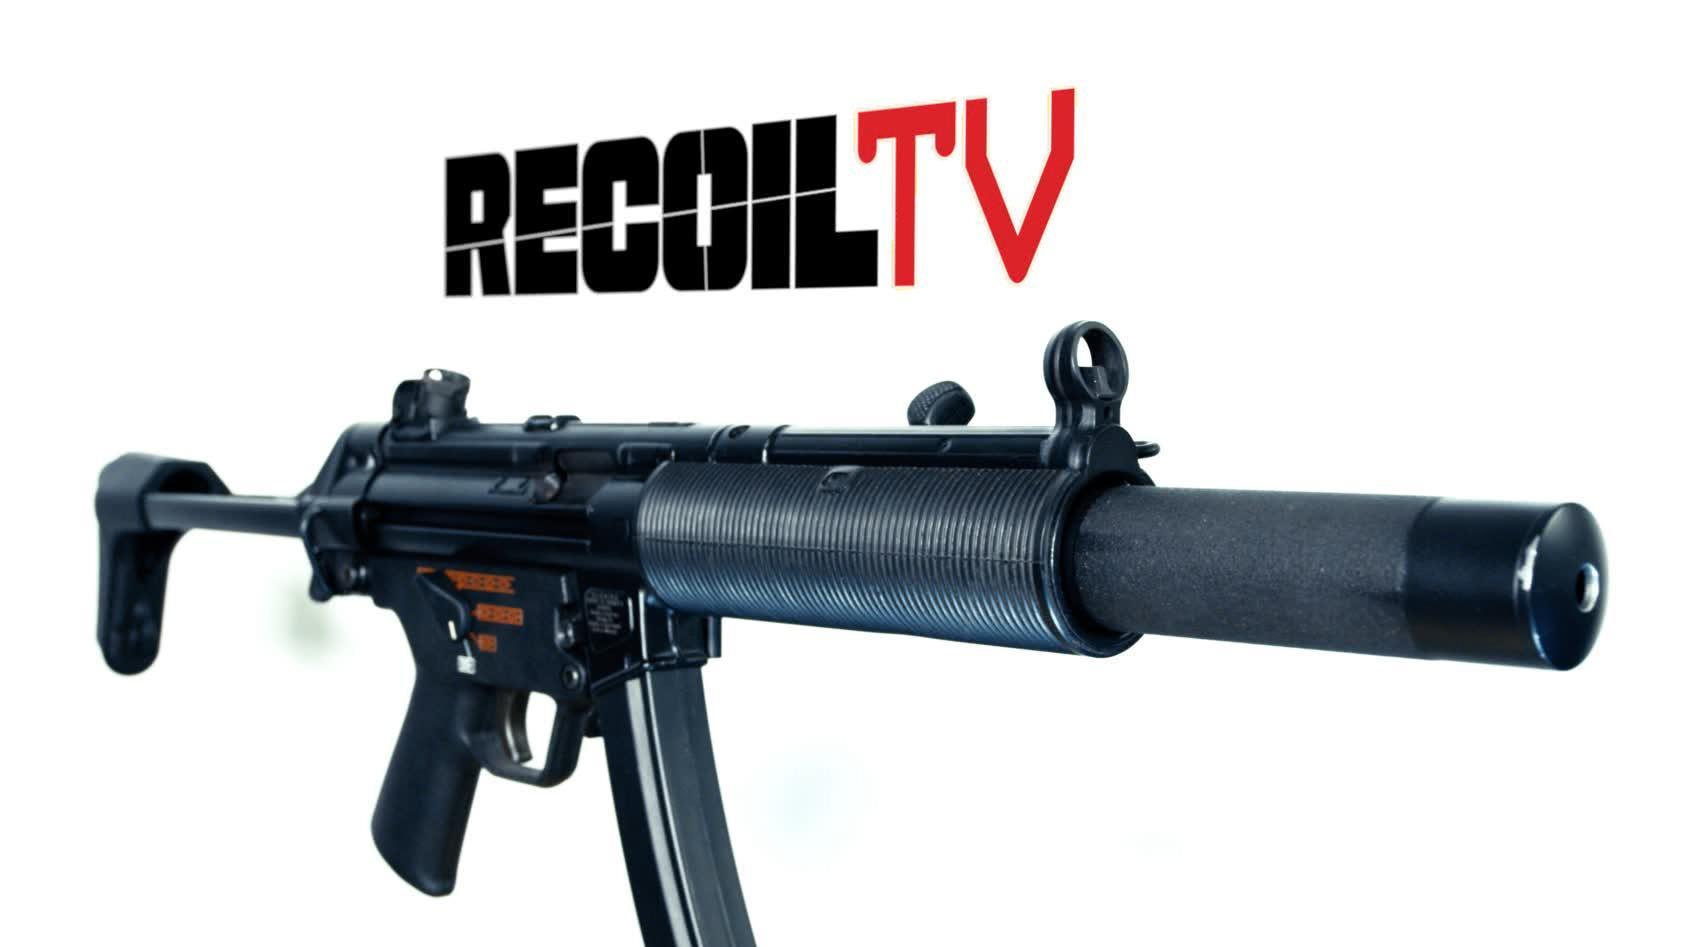 RECOIL - Firearm Lifestyle Magazine